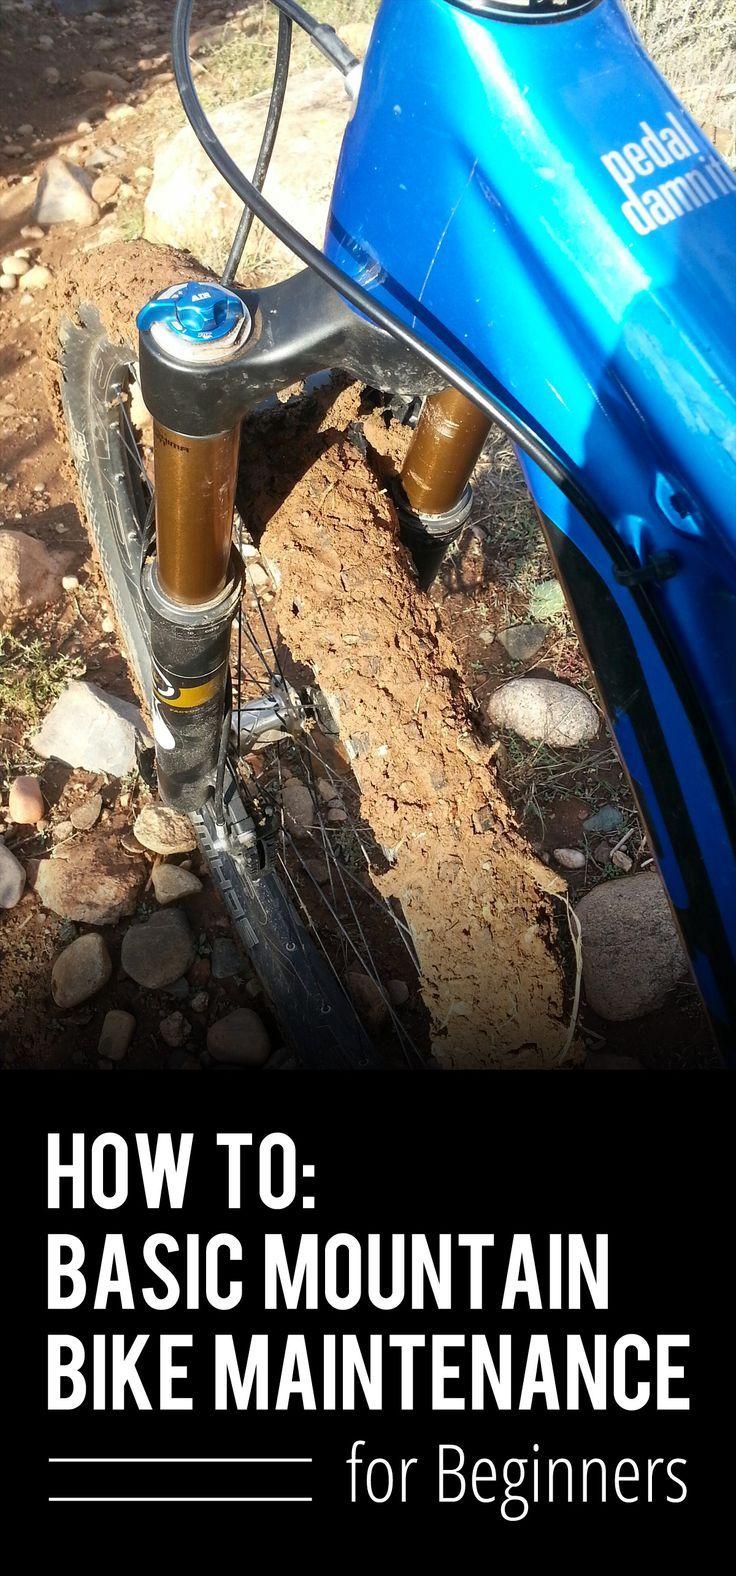 How to: Basic Mountain Bike Maintenance for Beginners